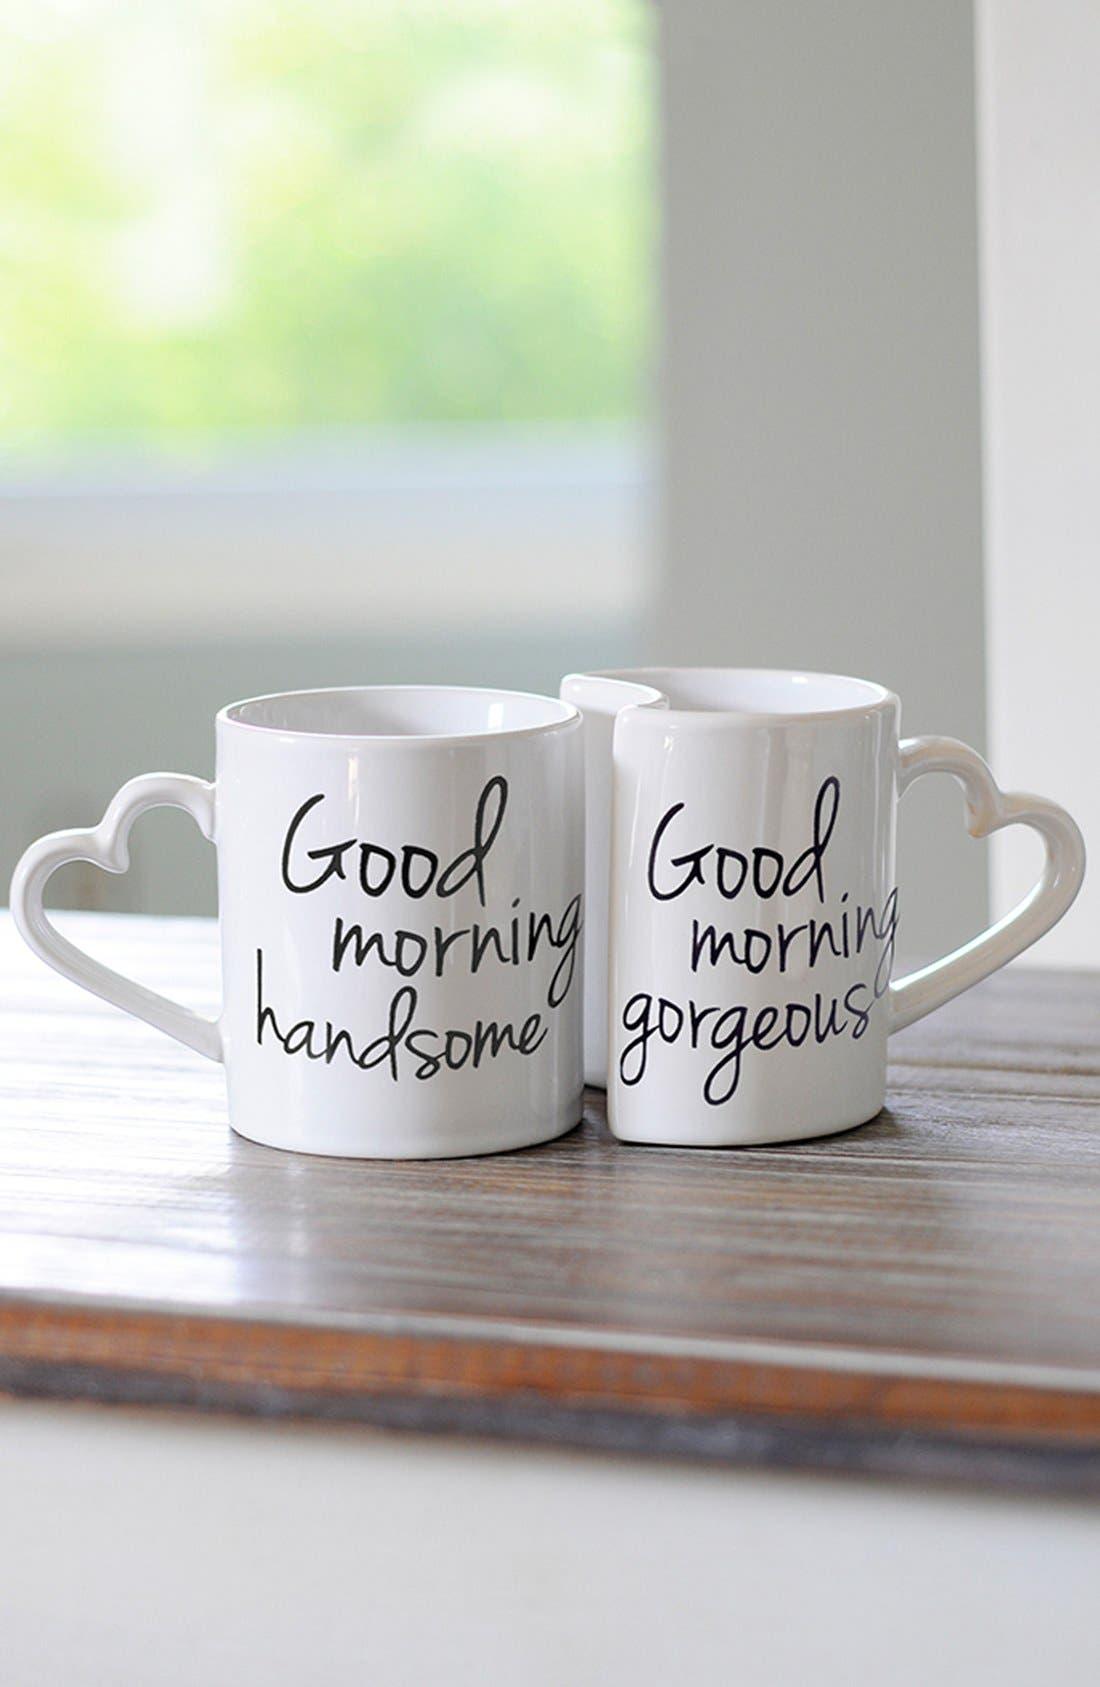 Main Image - Cathy's Concepts 'Good Morning' Ceramic Coffee Mugs (Set of 2)